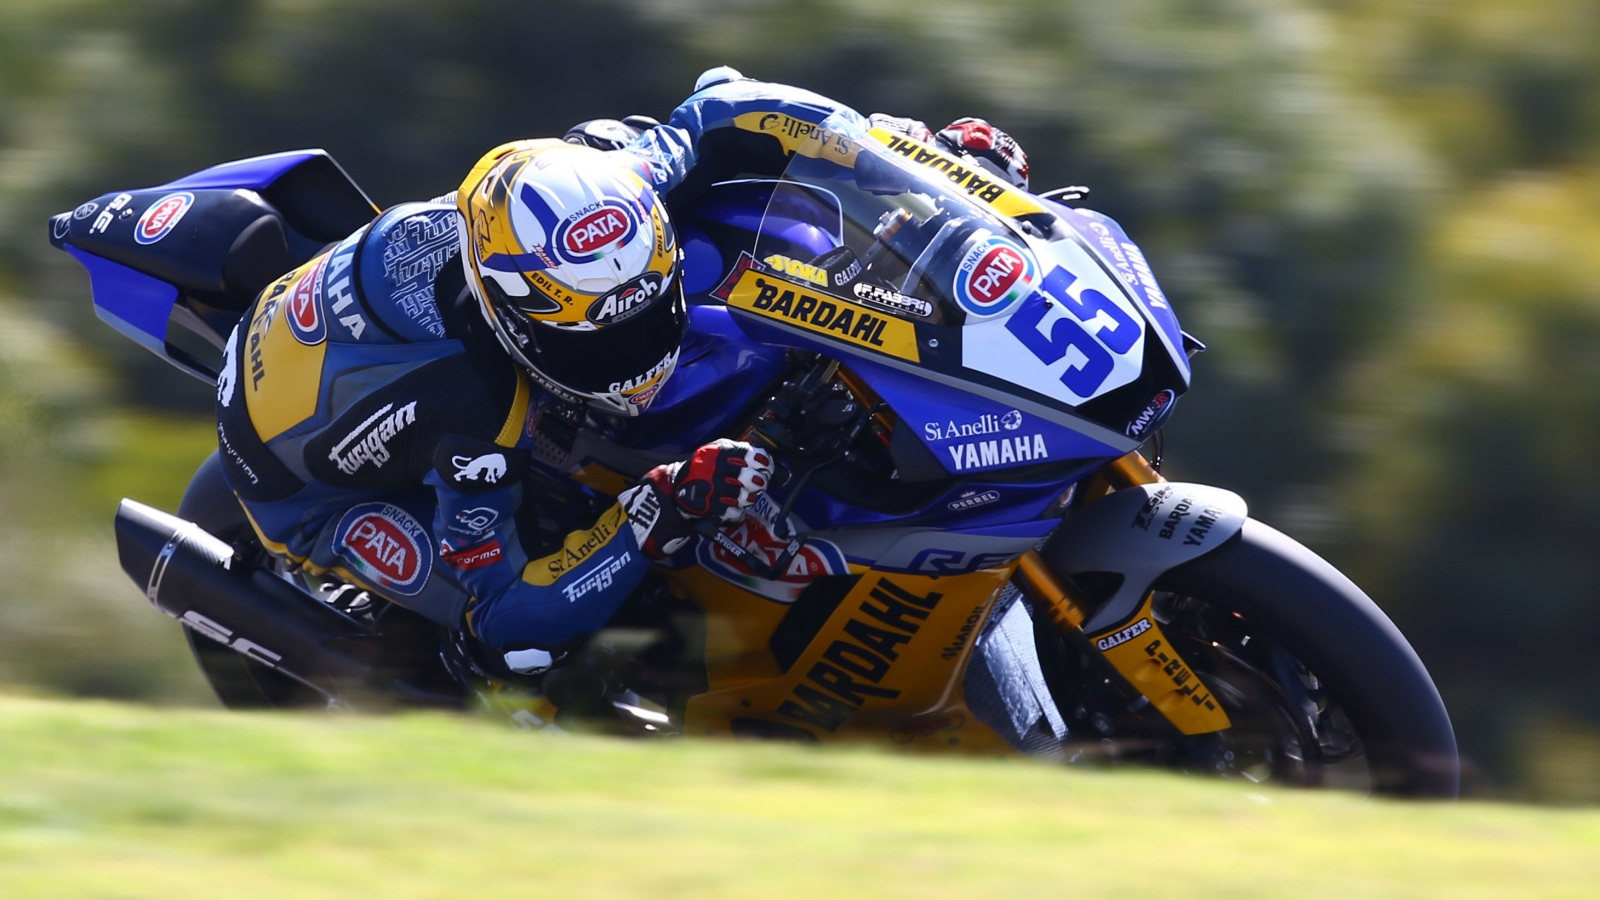 Andrea Locatelli logra la quinta seguida e Isaac Viñales logra su primer podio del año